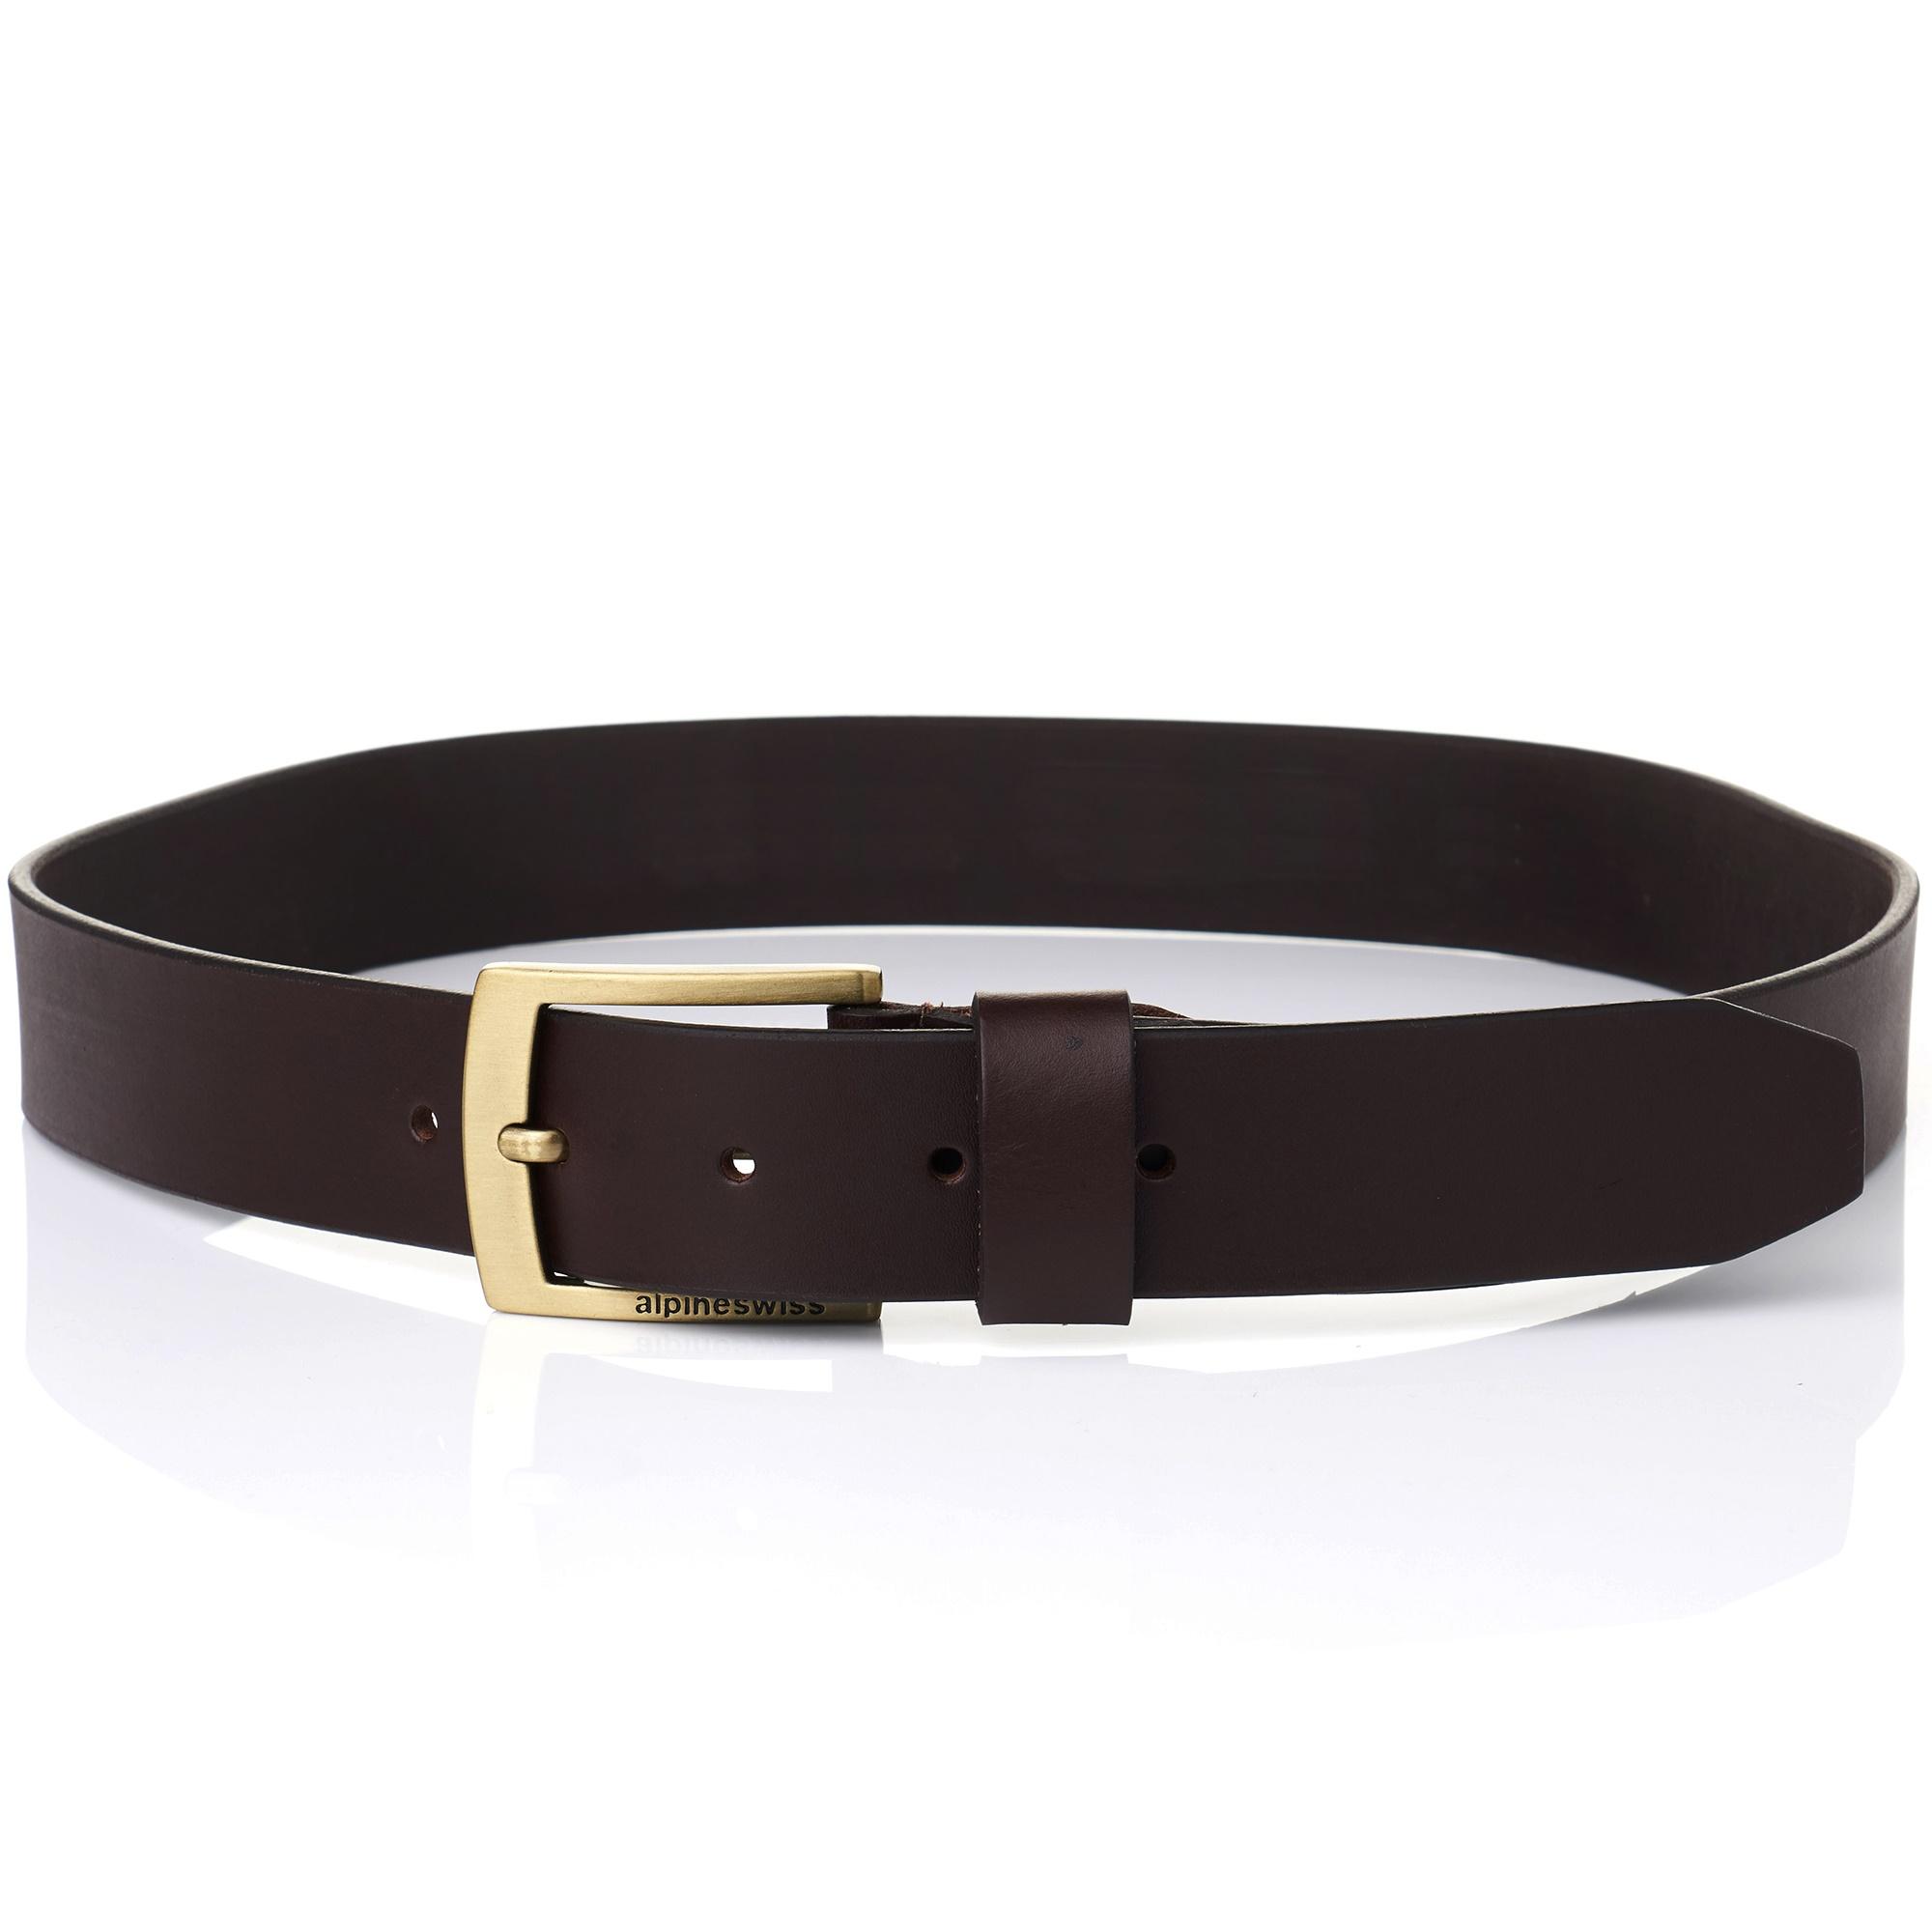 Alpine-Swiss-Mens-Leather-Belt-Slim-1-1-4-Casual-Jean-Dakota-Signature-Buckle thumbnail 19